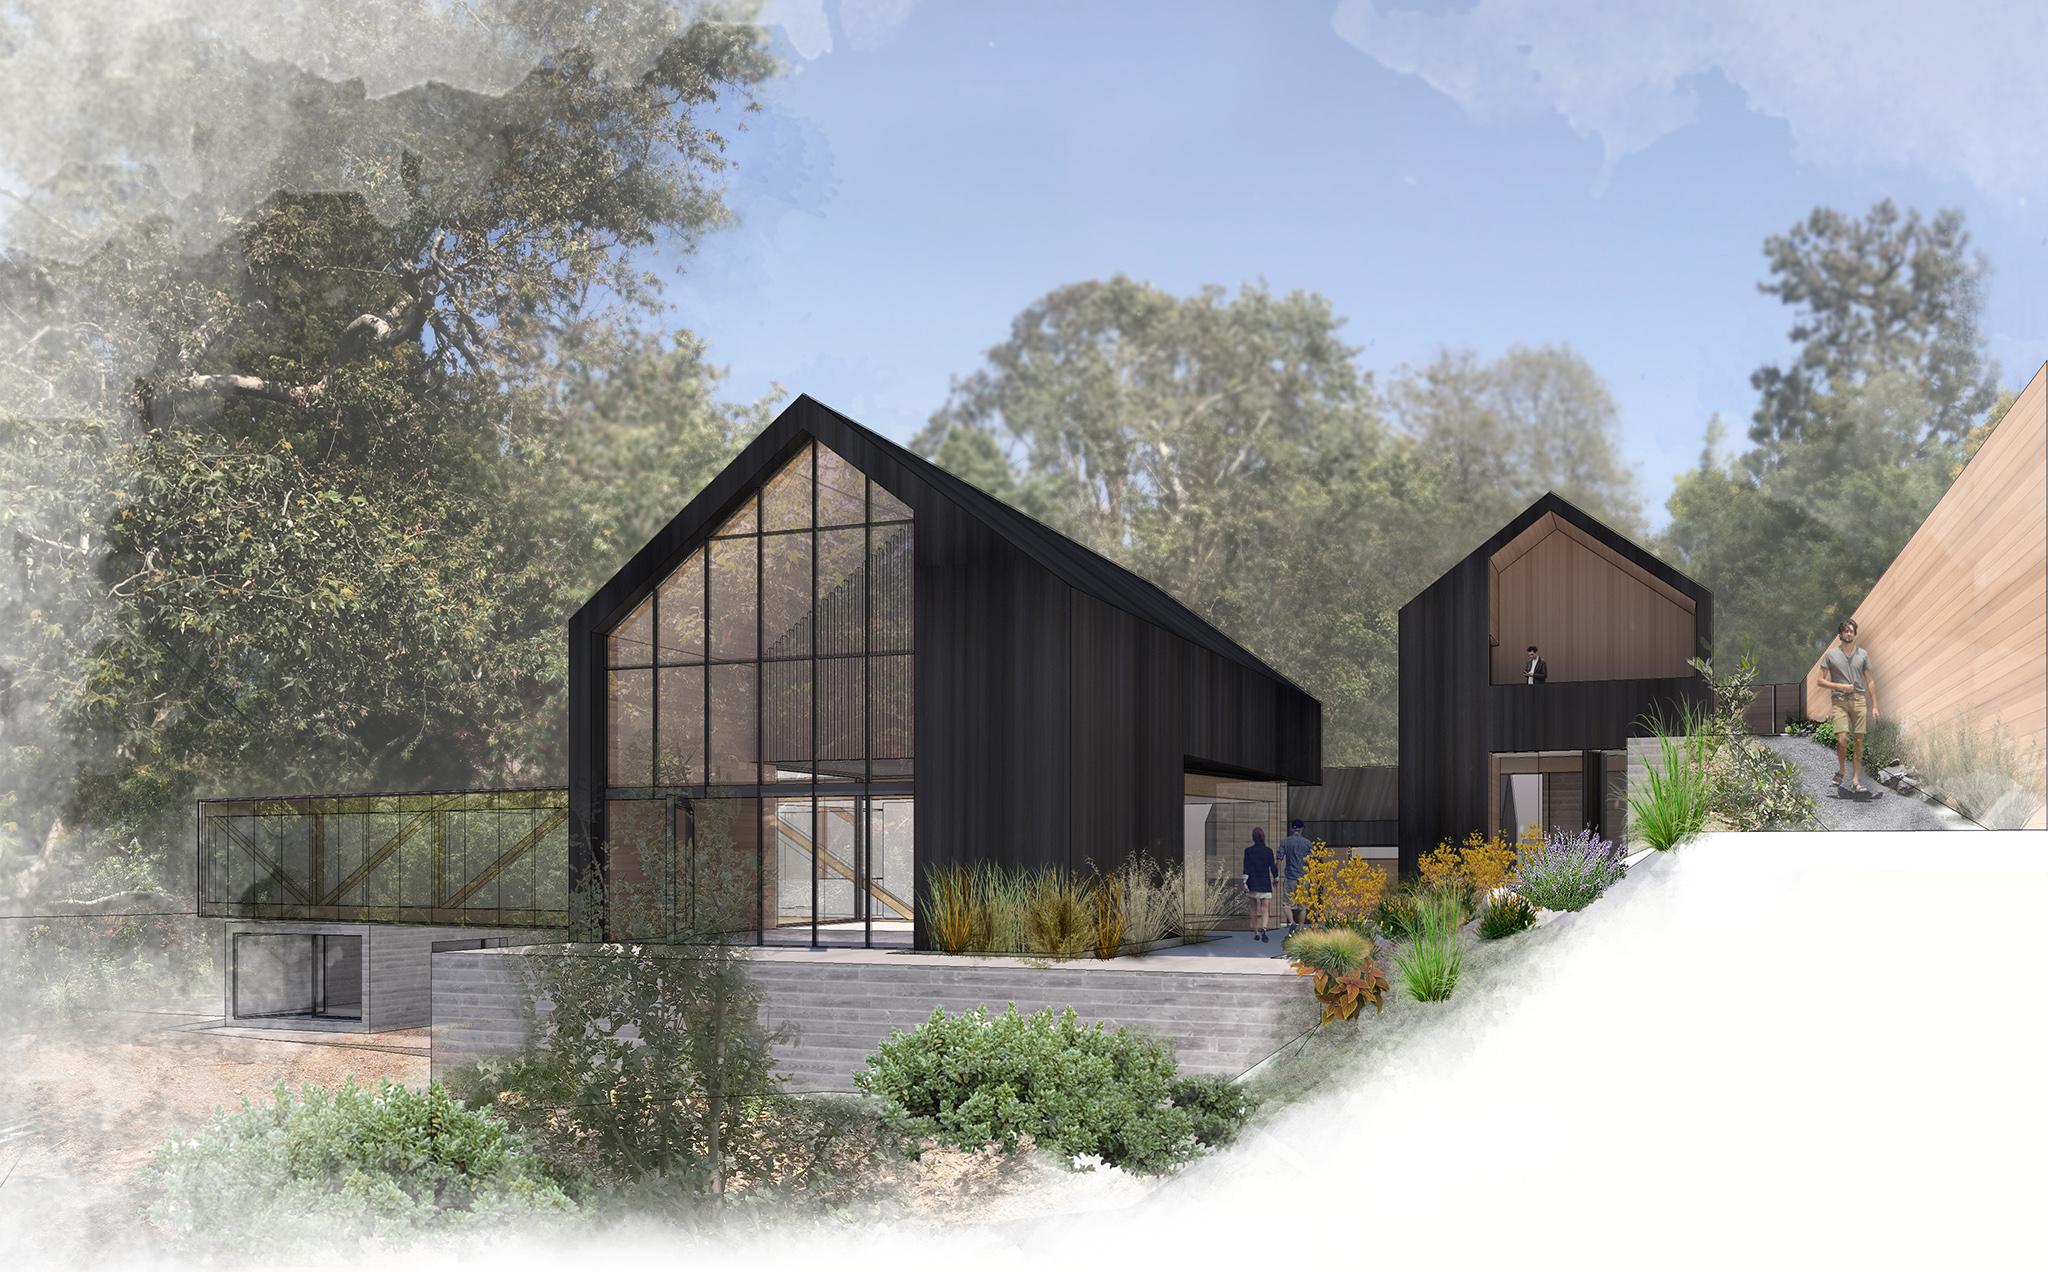 assembledge, santa monica, residential, project